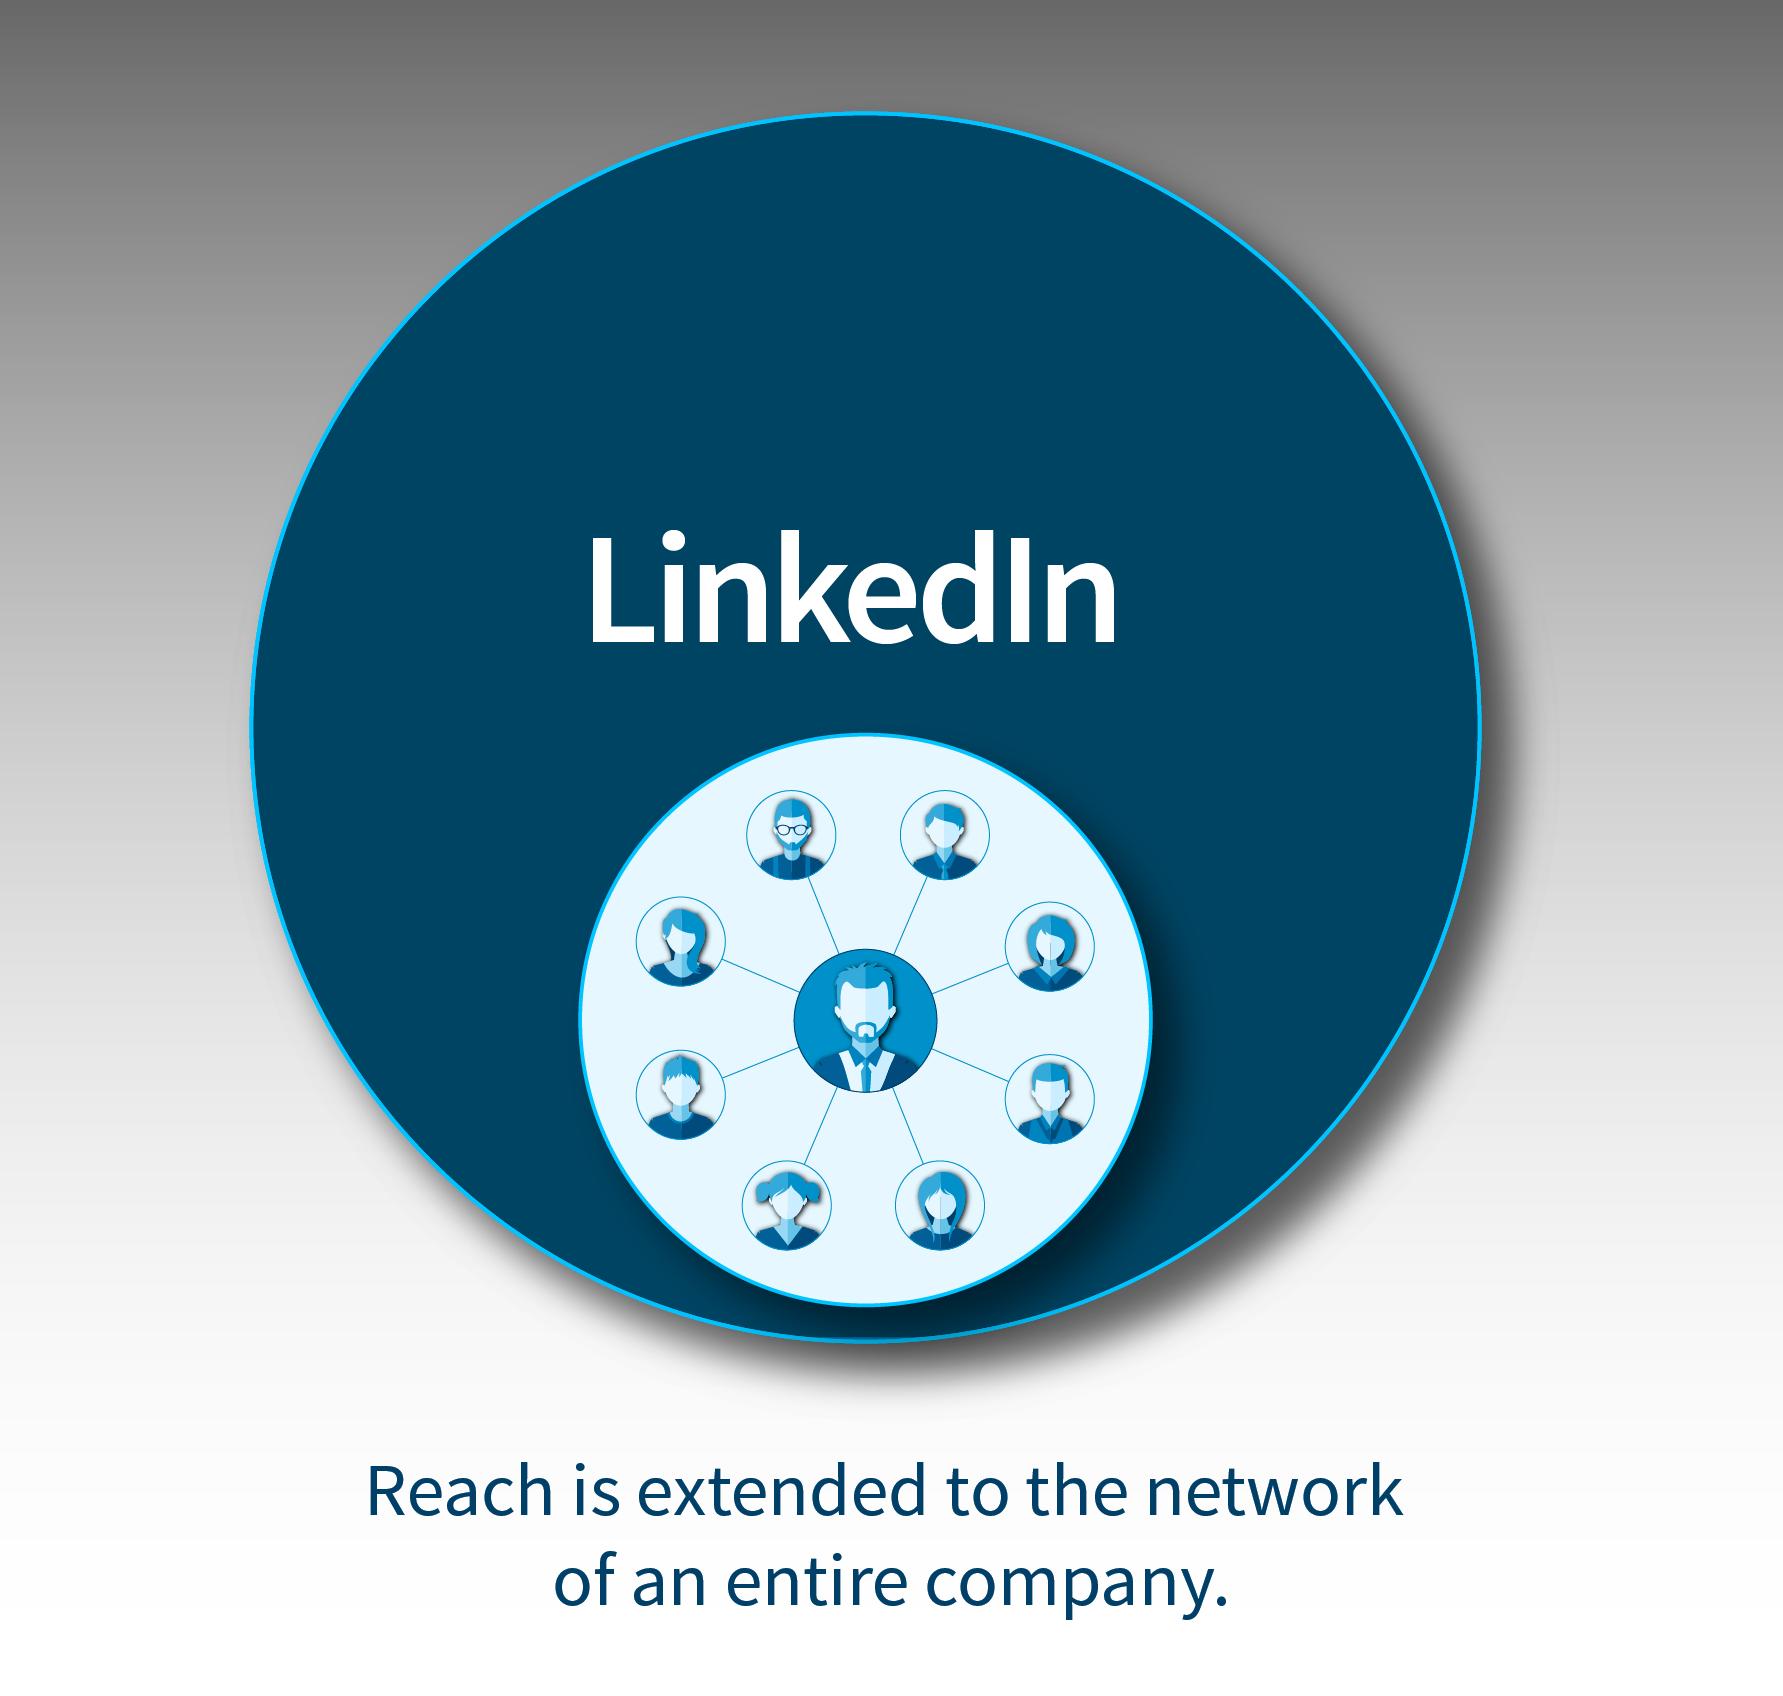 LinkedIn-Graphic-02.2